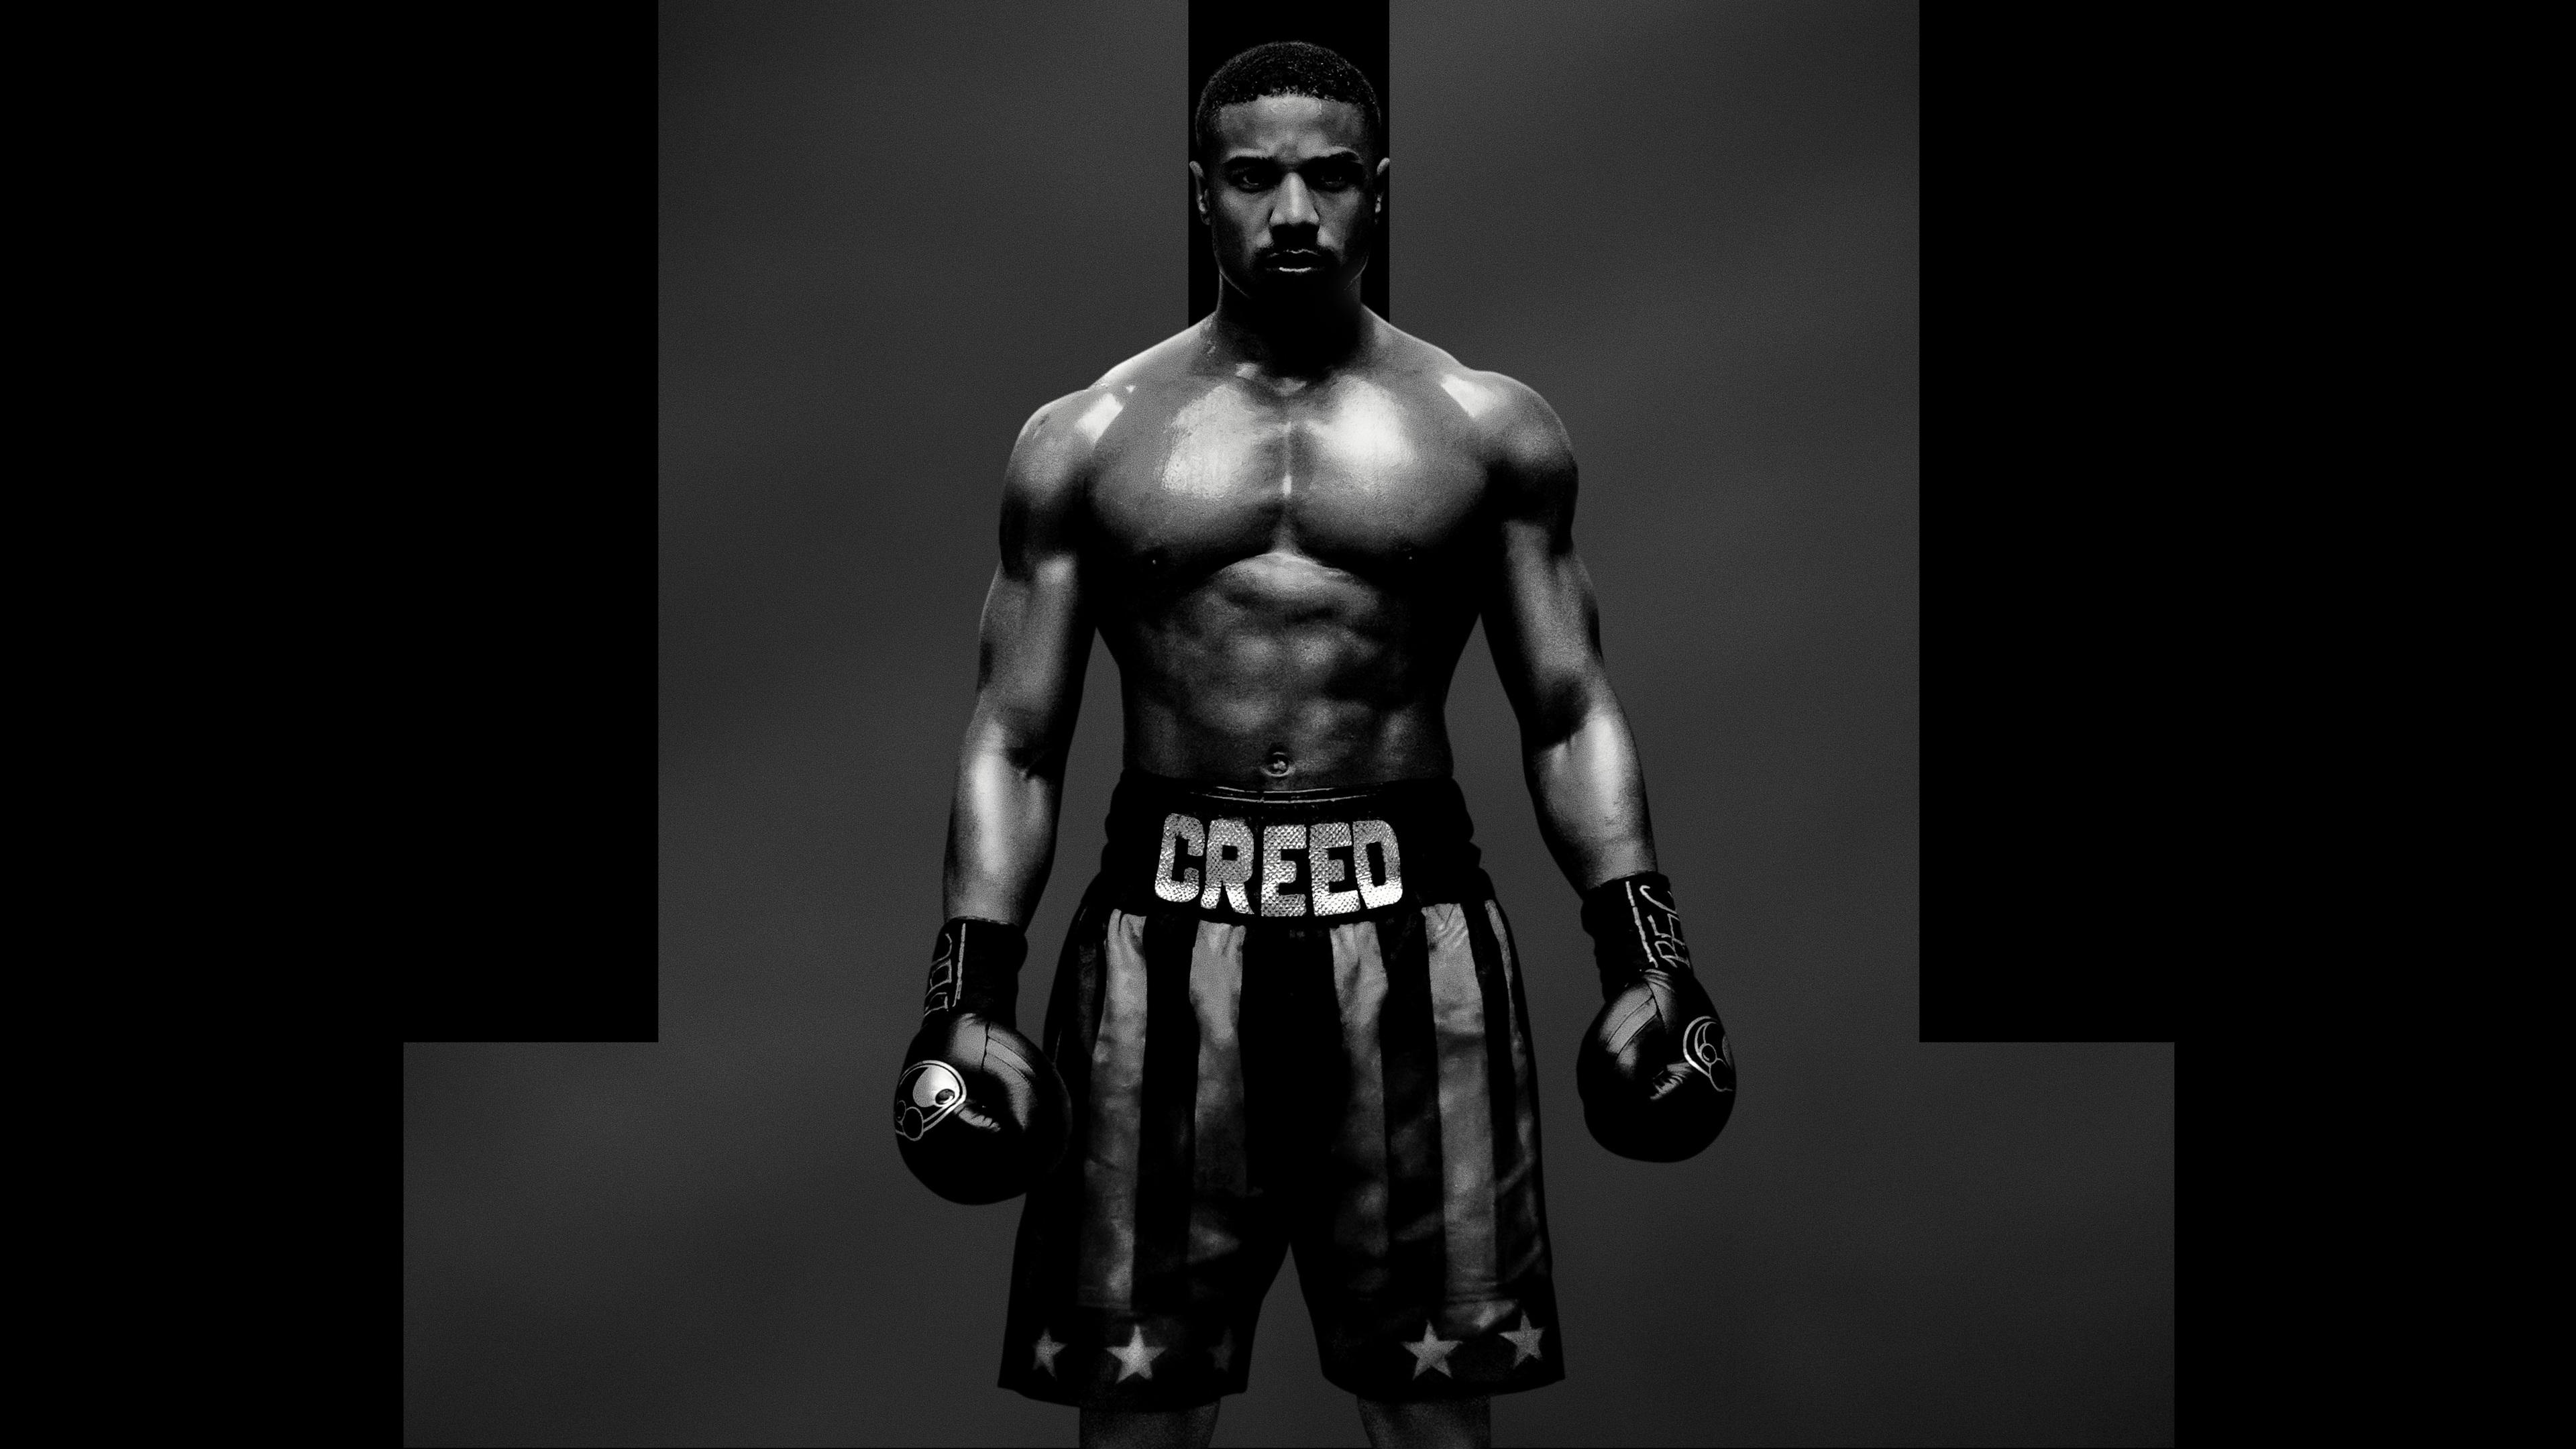 creed 2 movie 1537645137 - Creed 2 Movie - movies wallpapers, michael b jordan wallpapers, hd-wallpapers, creed 2 wallpapers, 5k wallpapers, 4k-wallpapers, 2018-movies-wallpapers